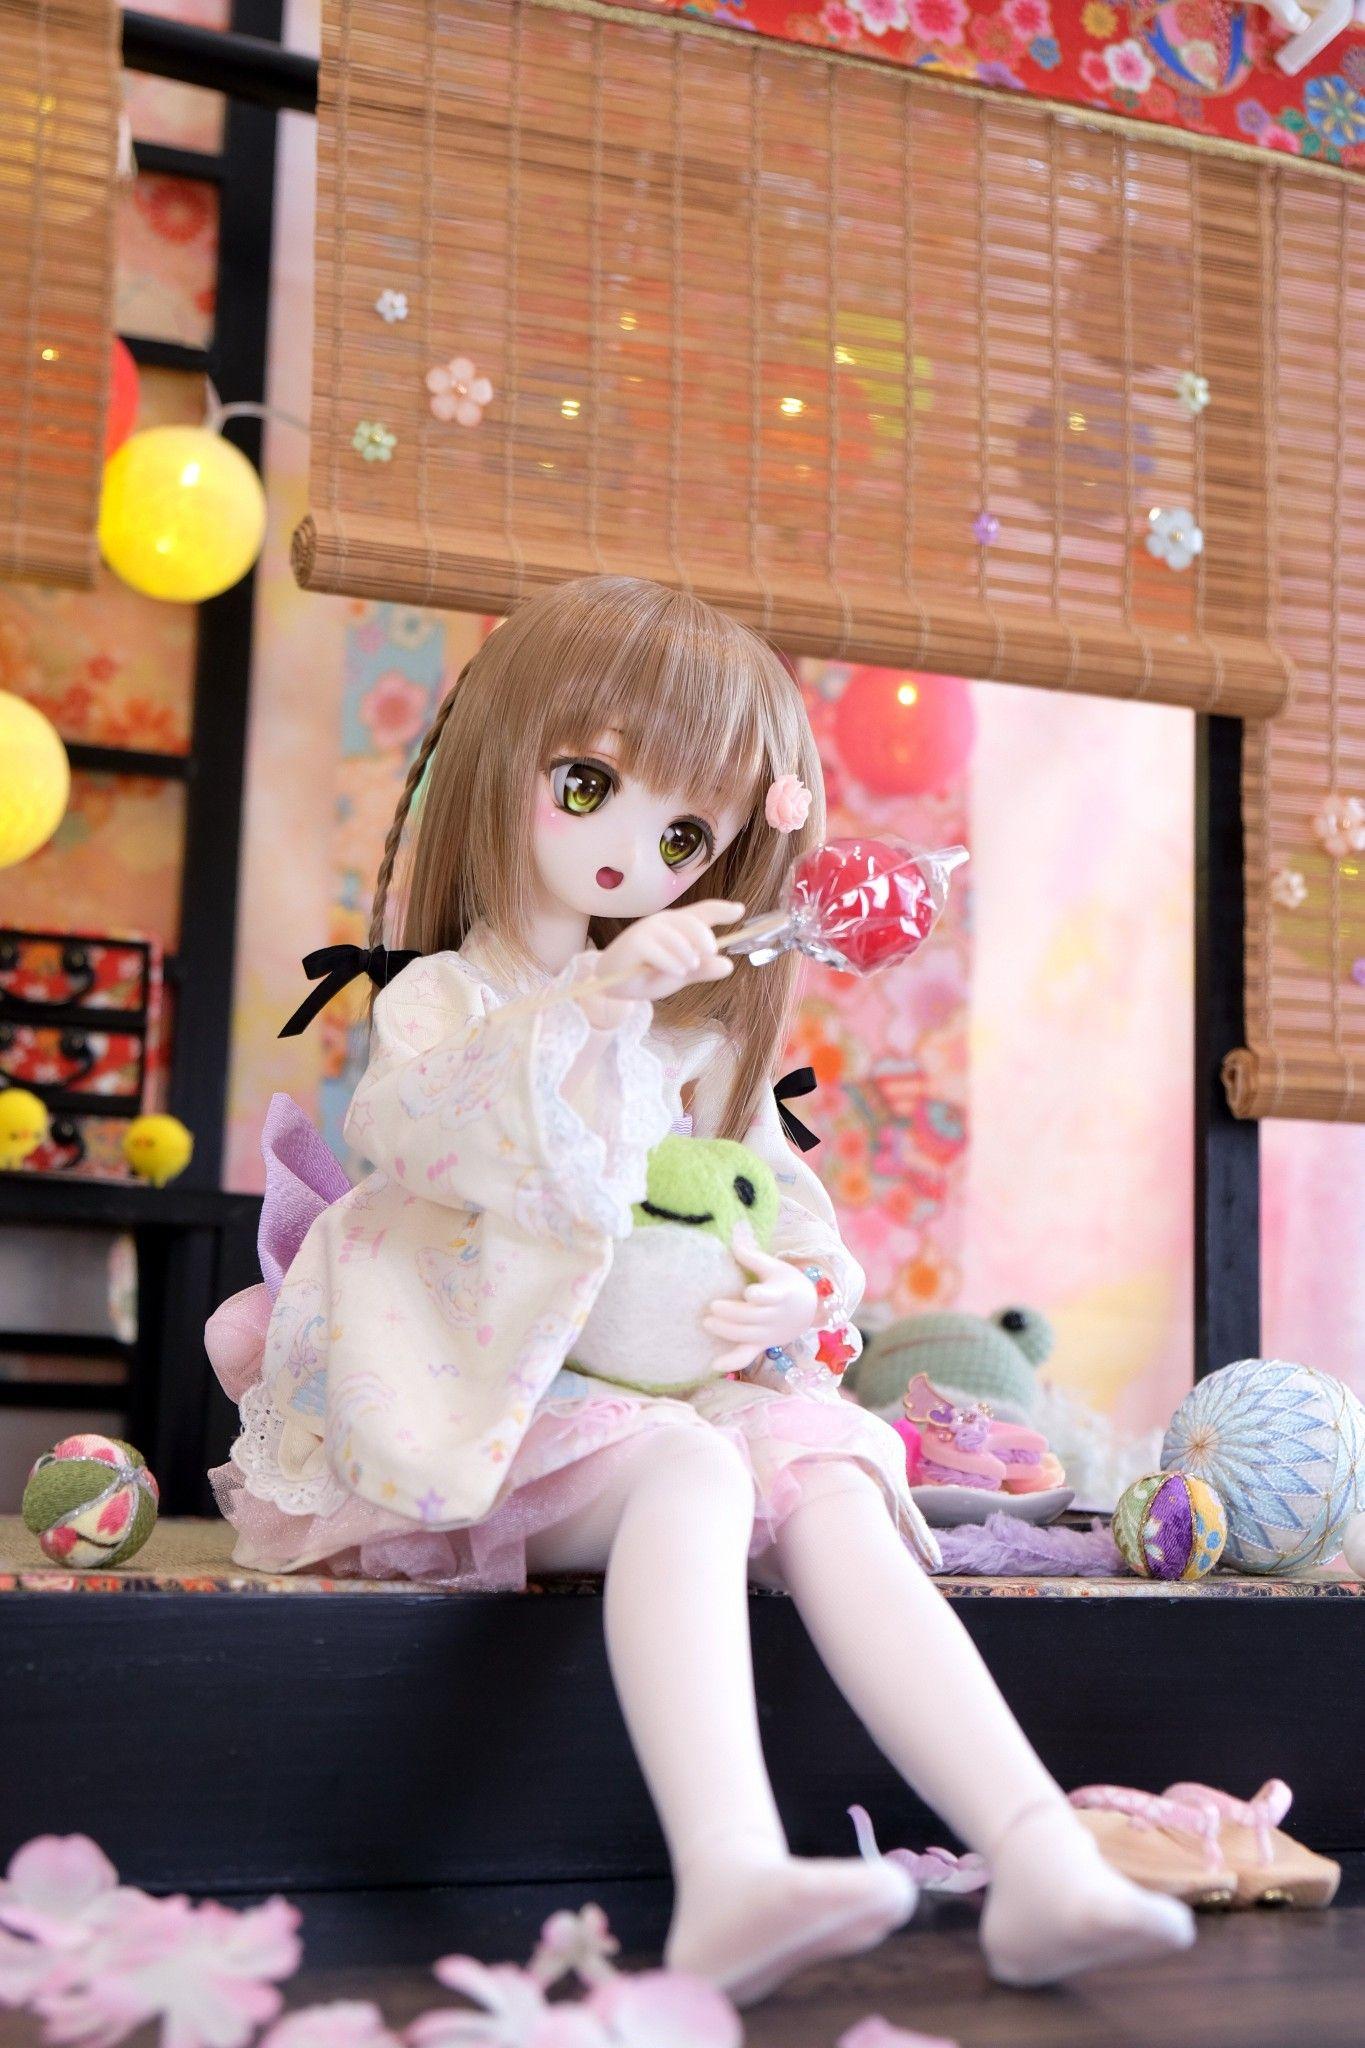 Kawaii anime doll nyu_u3kin on twitter anime dolls